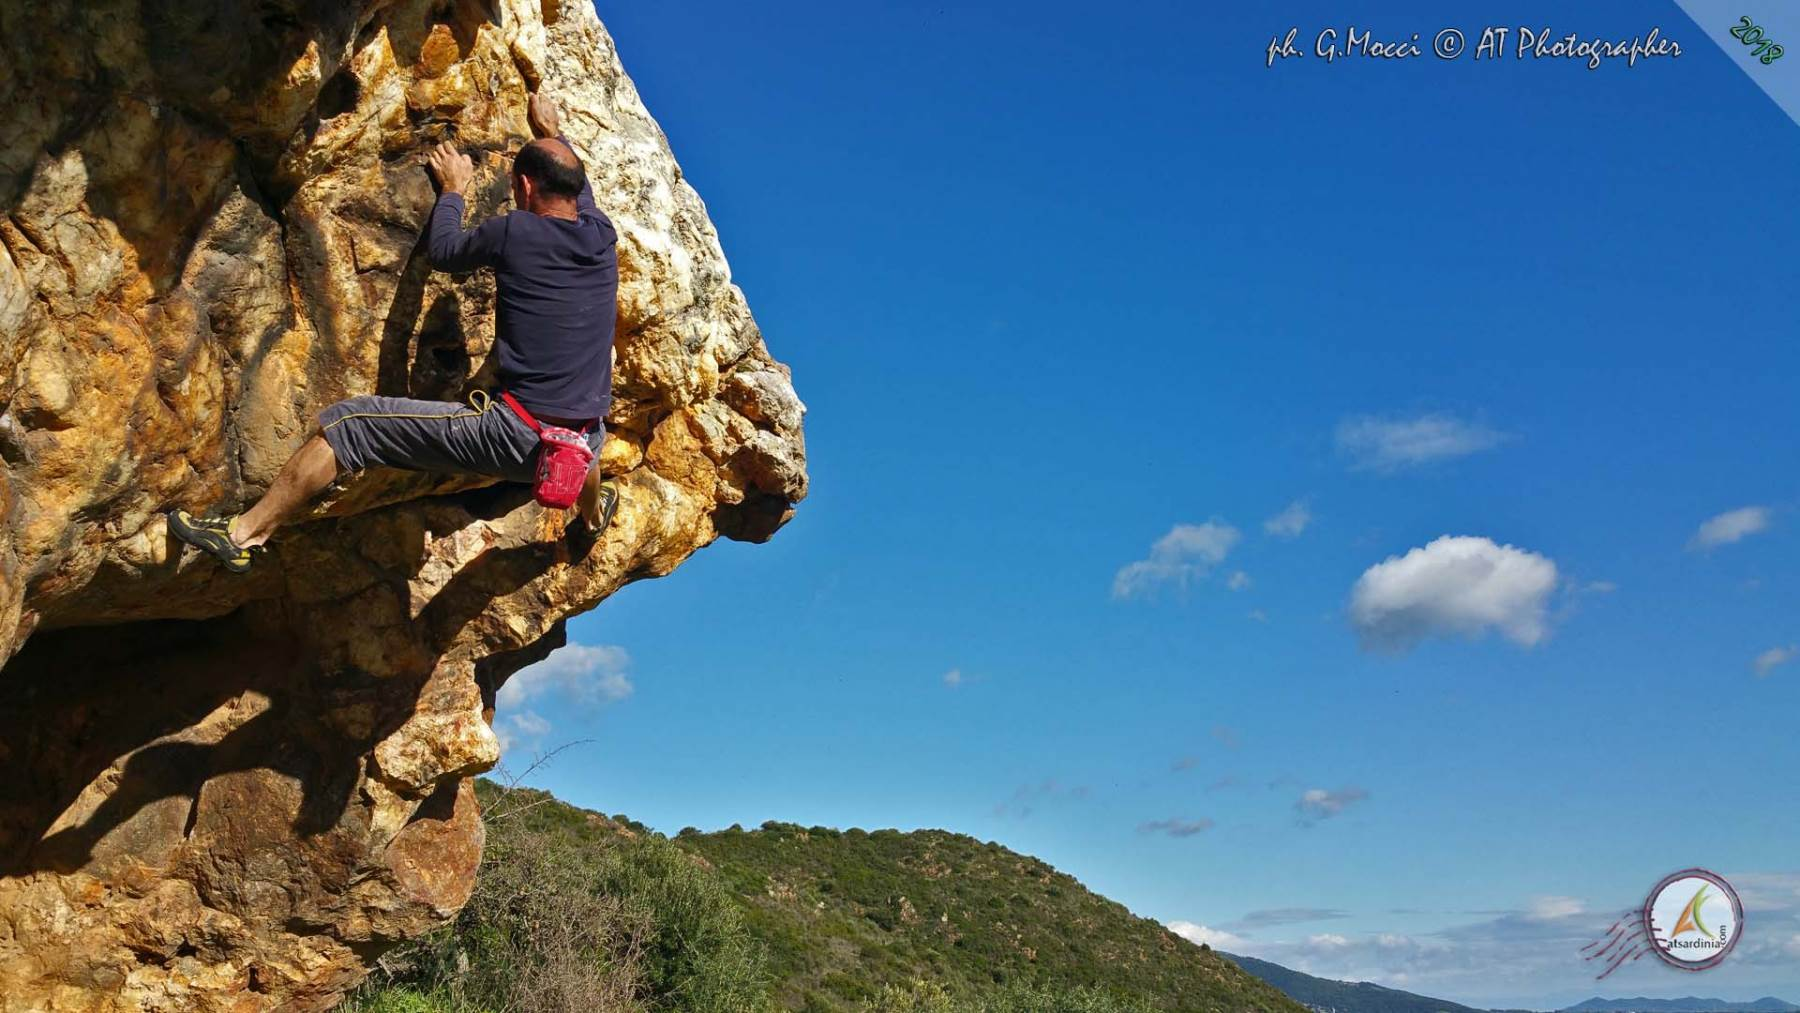 Domusland, una nuova area boulder - Giampaolo Mocci